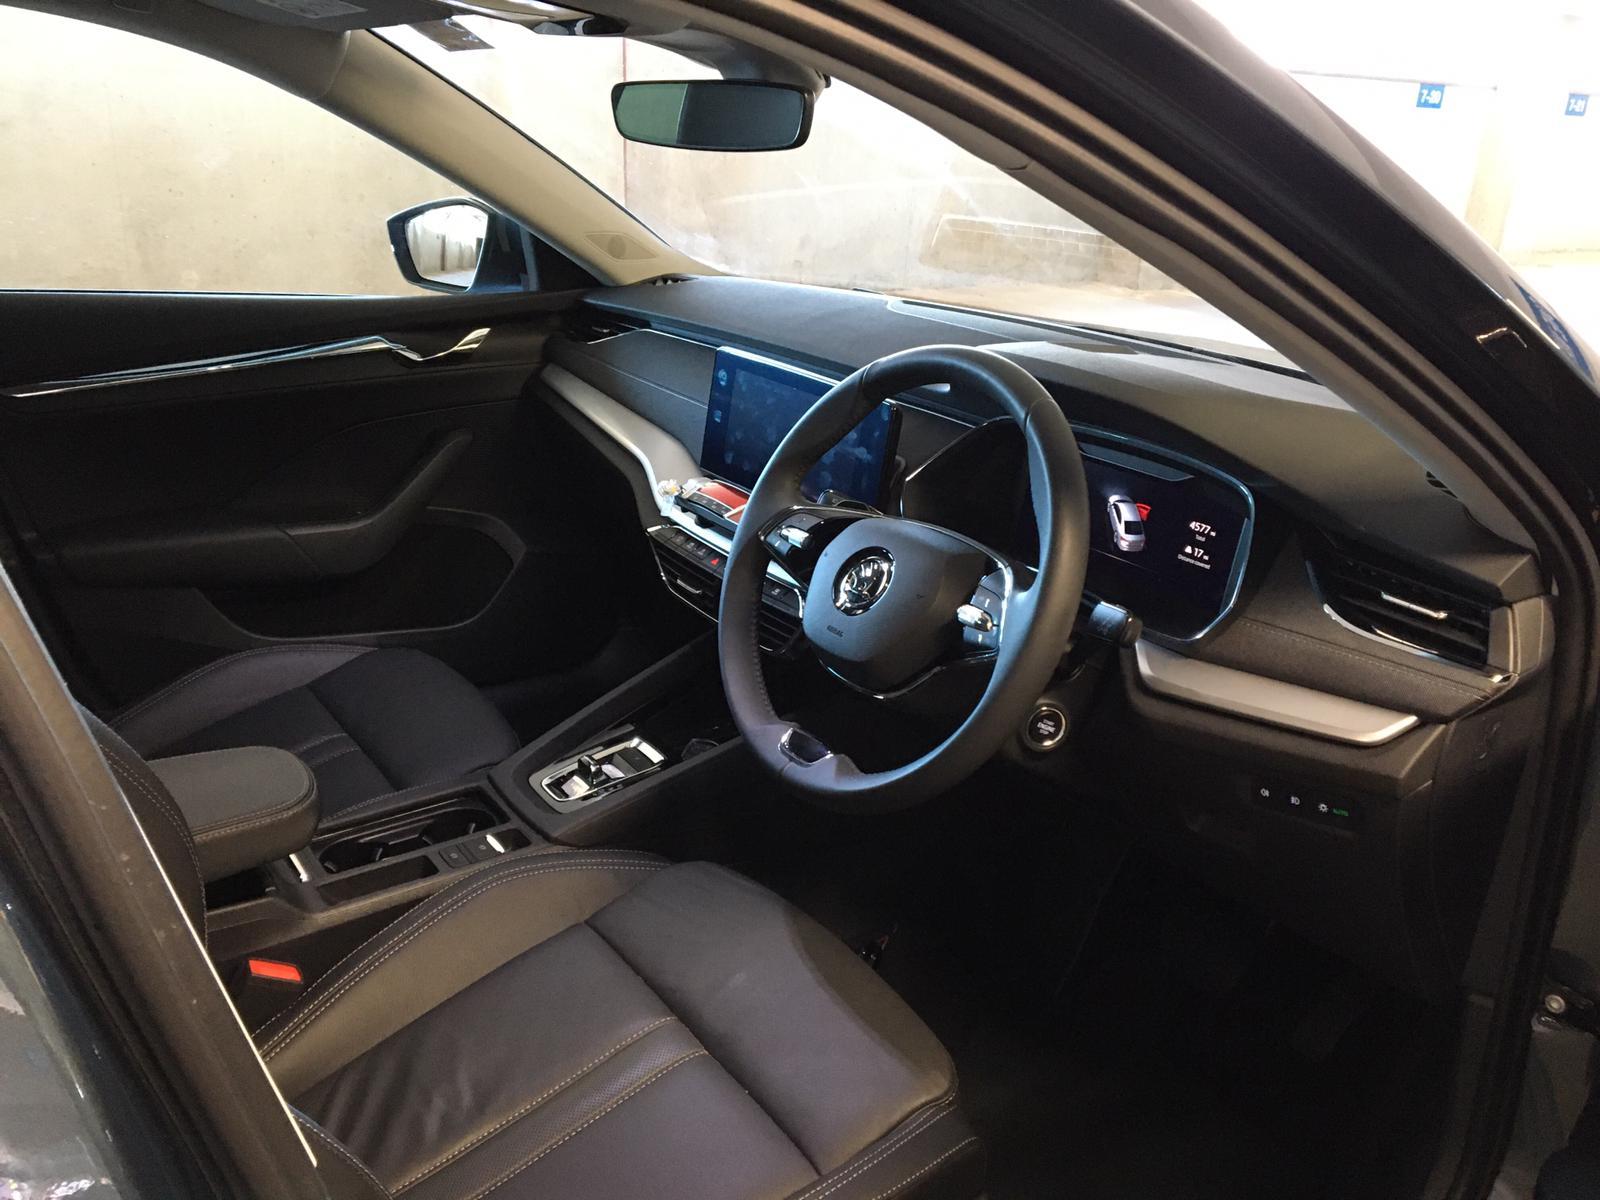 2021 Skoda Octavia Executive Hybrid Automatic full